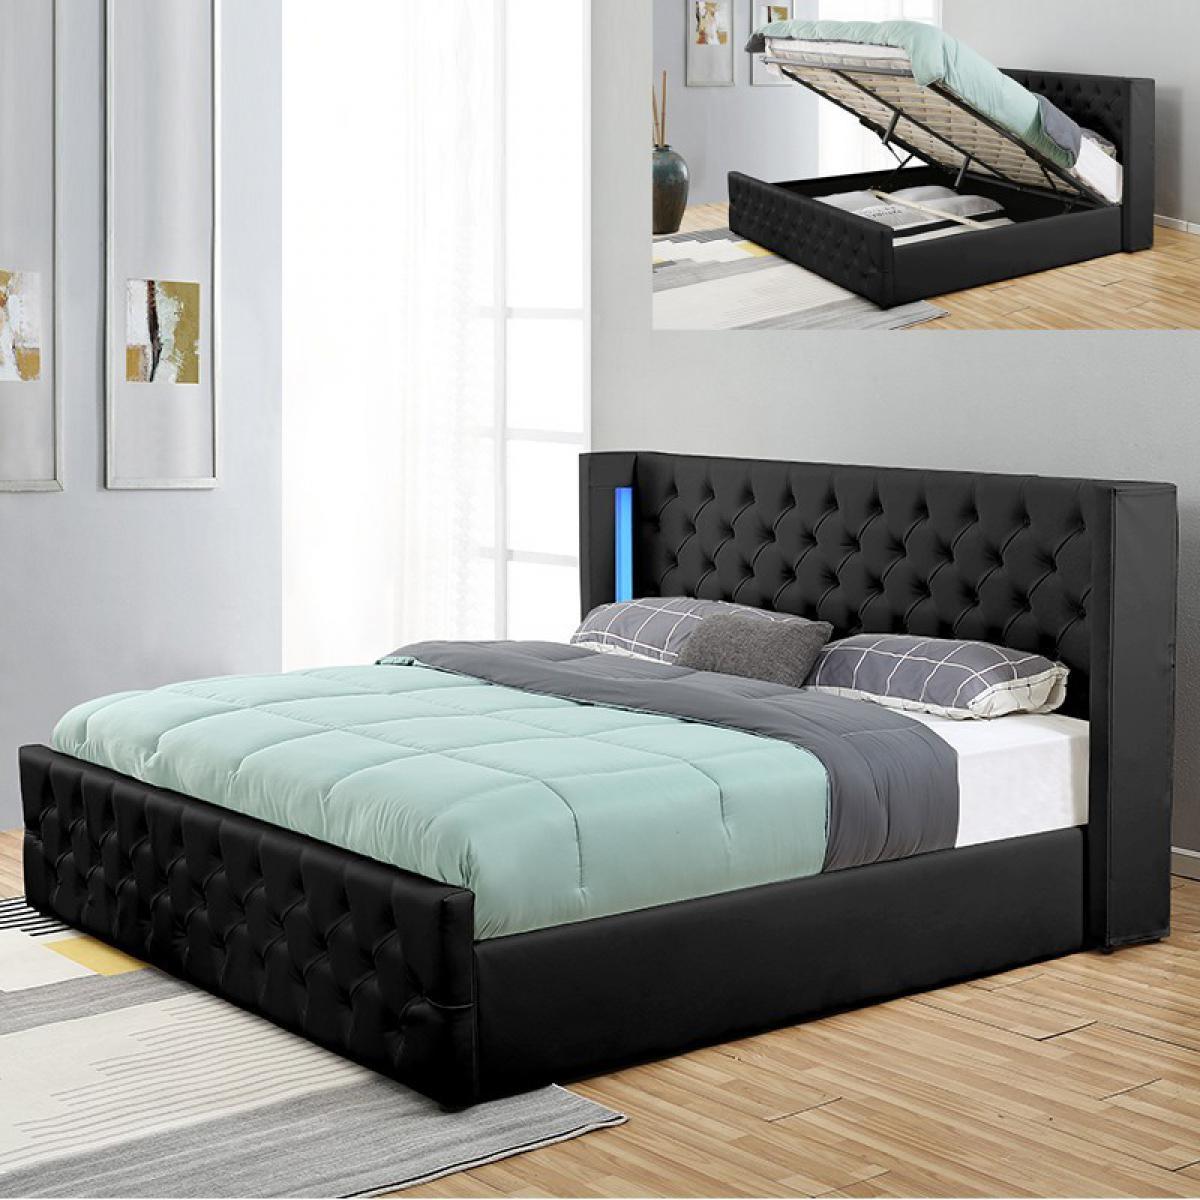 Meubler Design Lit coffre design avec led OSMOS - Noir - 140x190